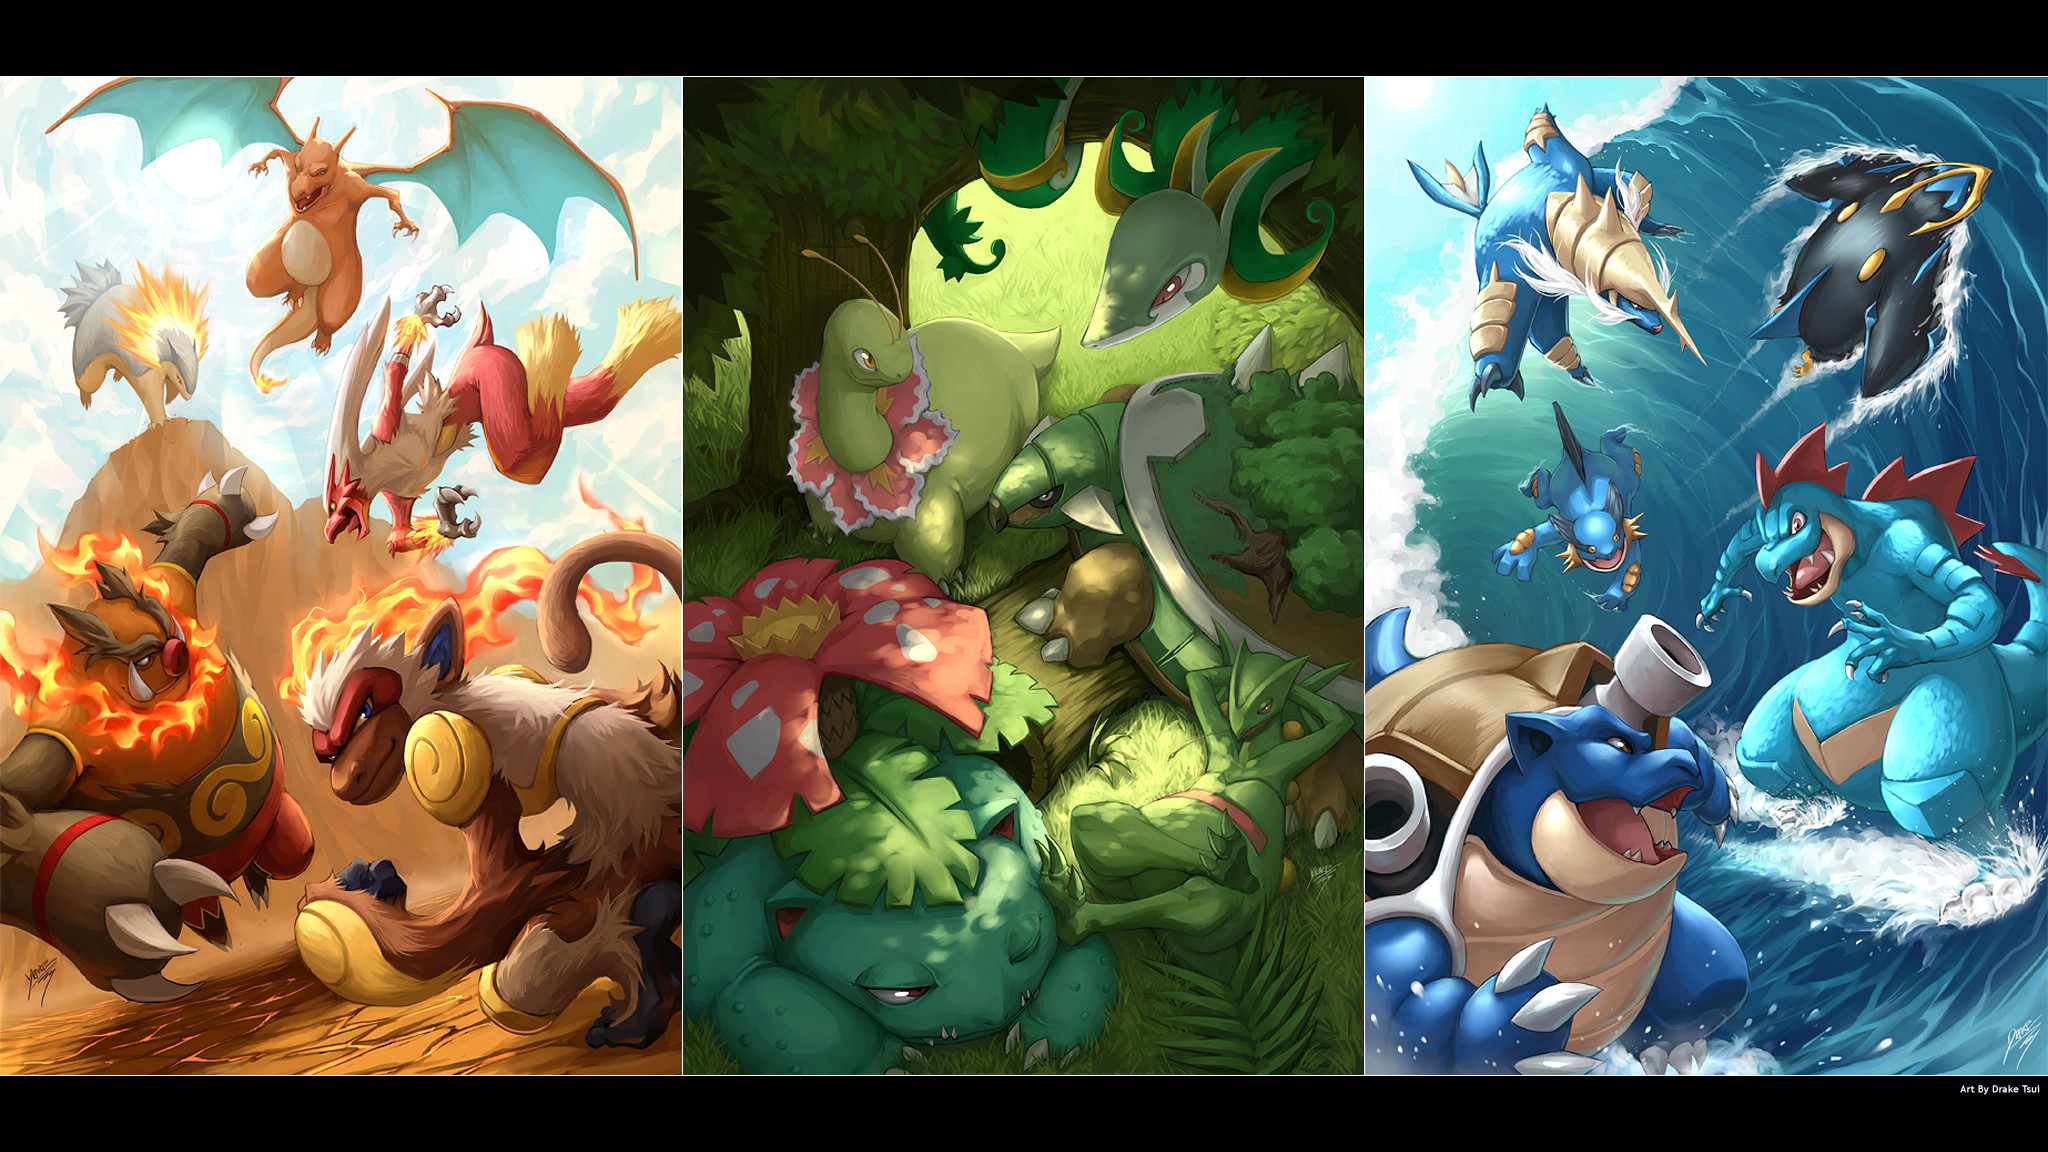 Pokemon Wallpaper 2560x1440 (79+ images)